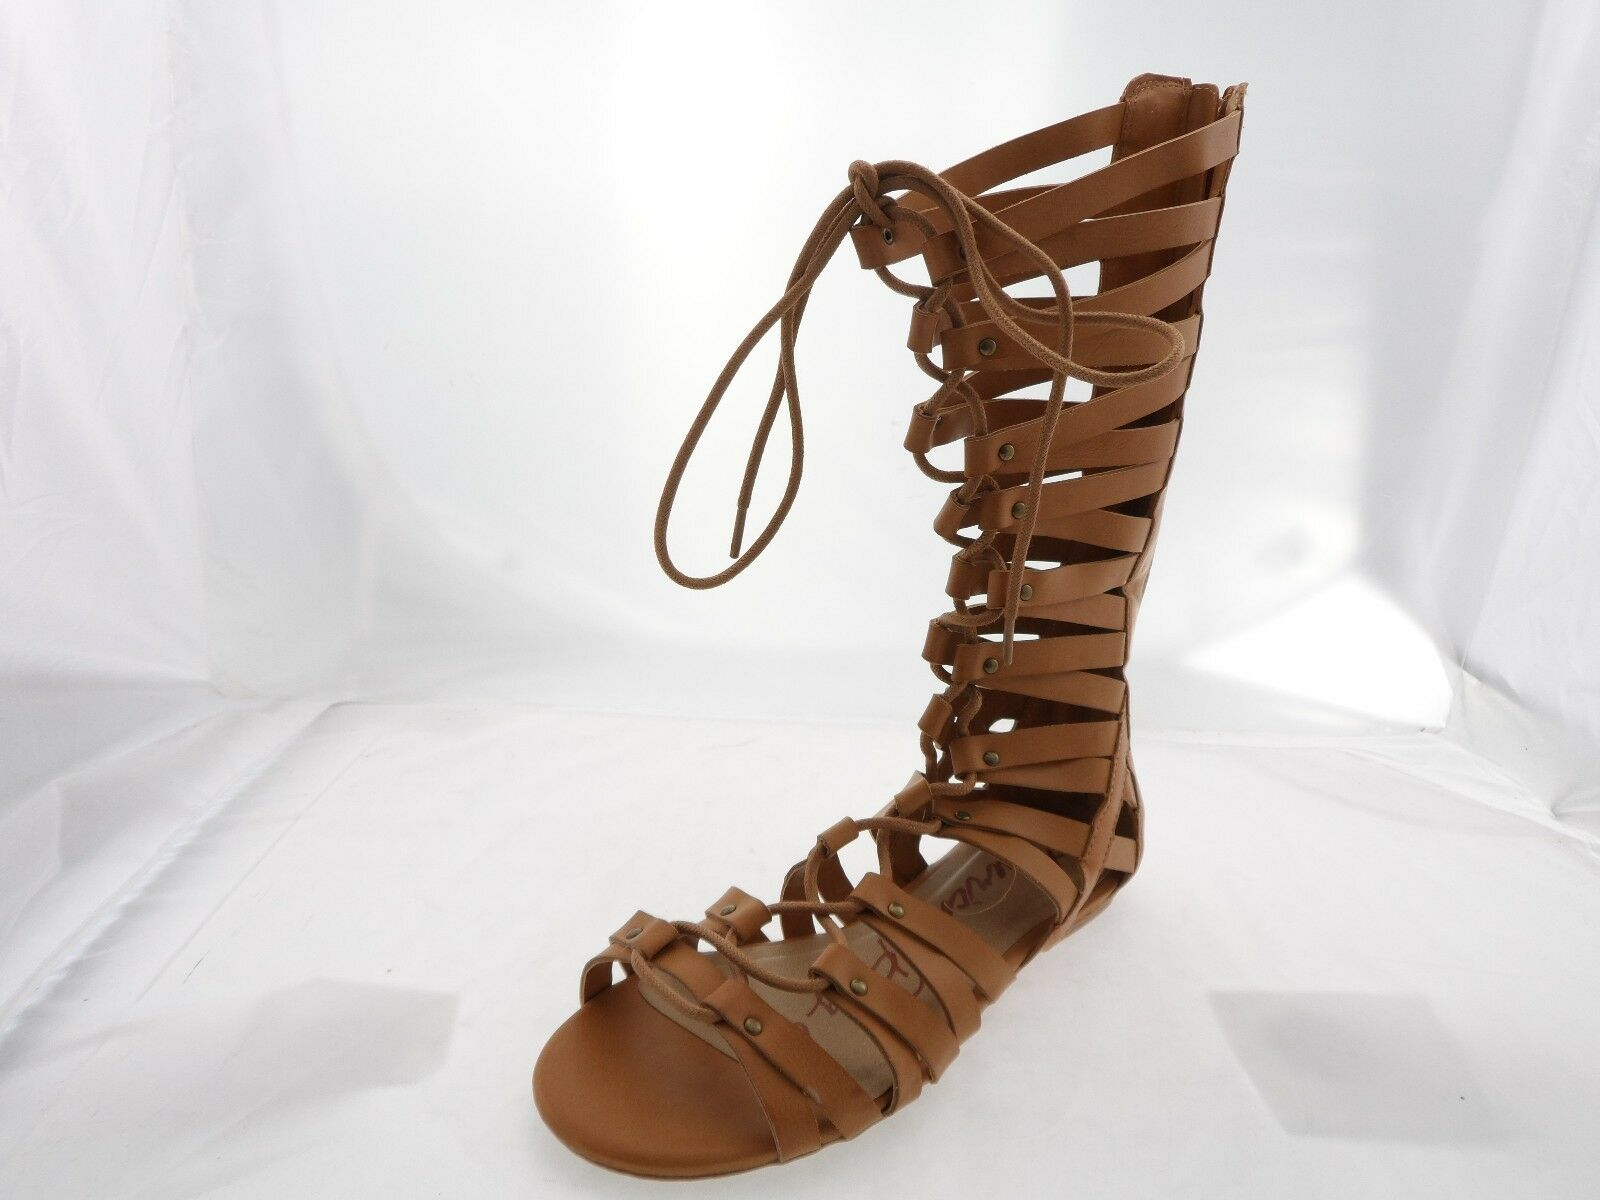 American Rag Maya Cie Women Gladiator Sandal, Burnt Tan, Size 8.5 US